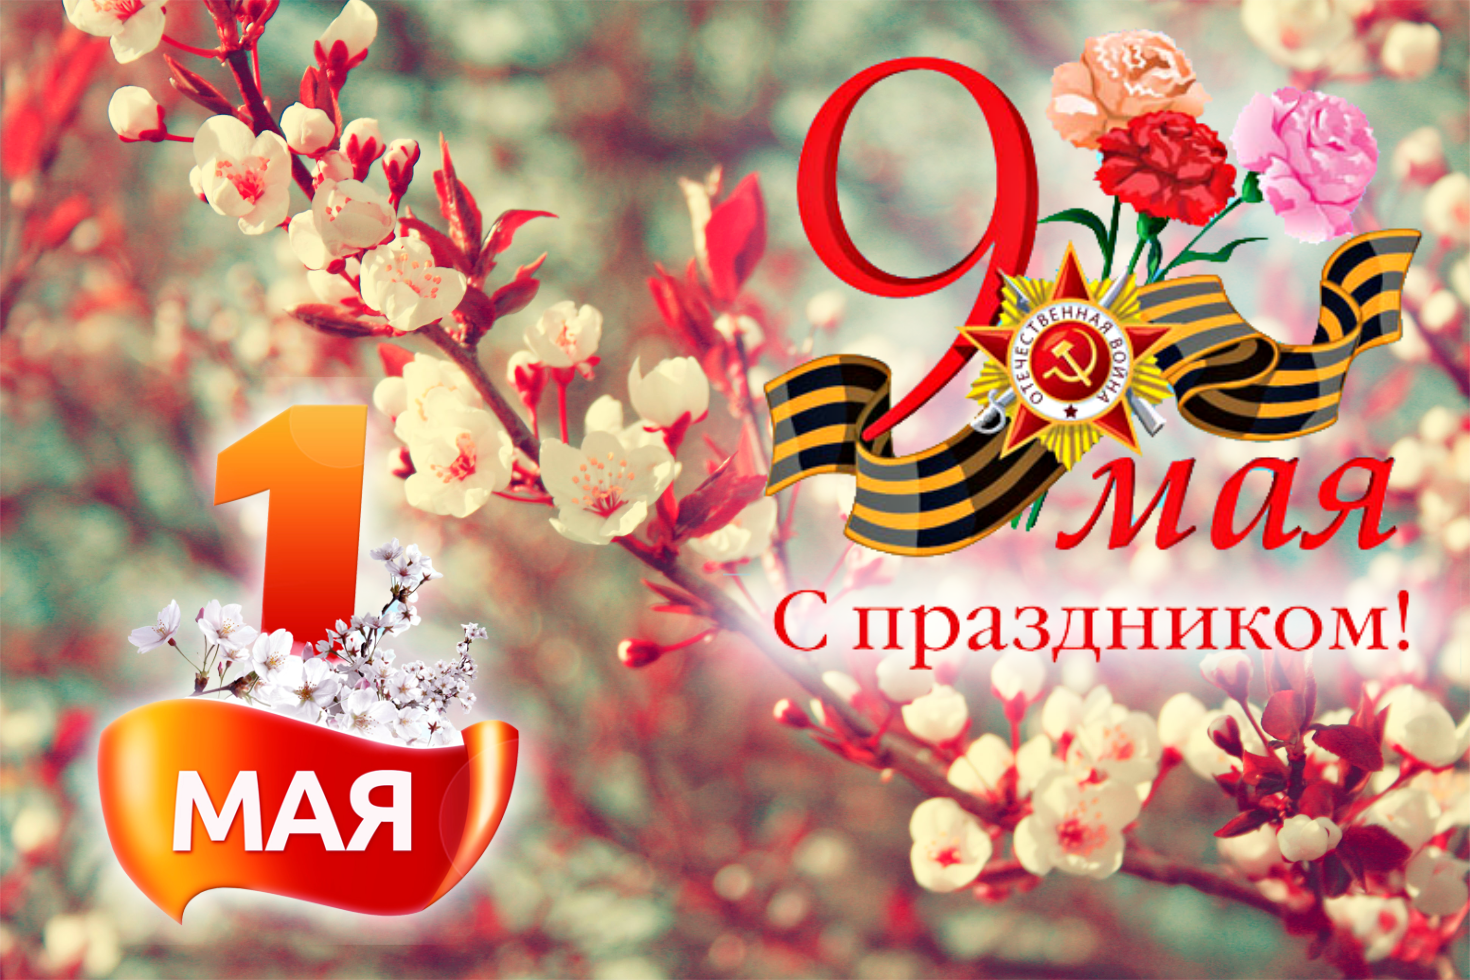 https://static-sl.insales.ru/images/articles/1/142/999566/prazdnik.png